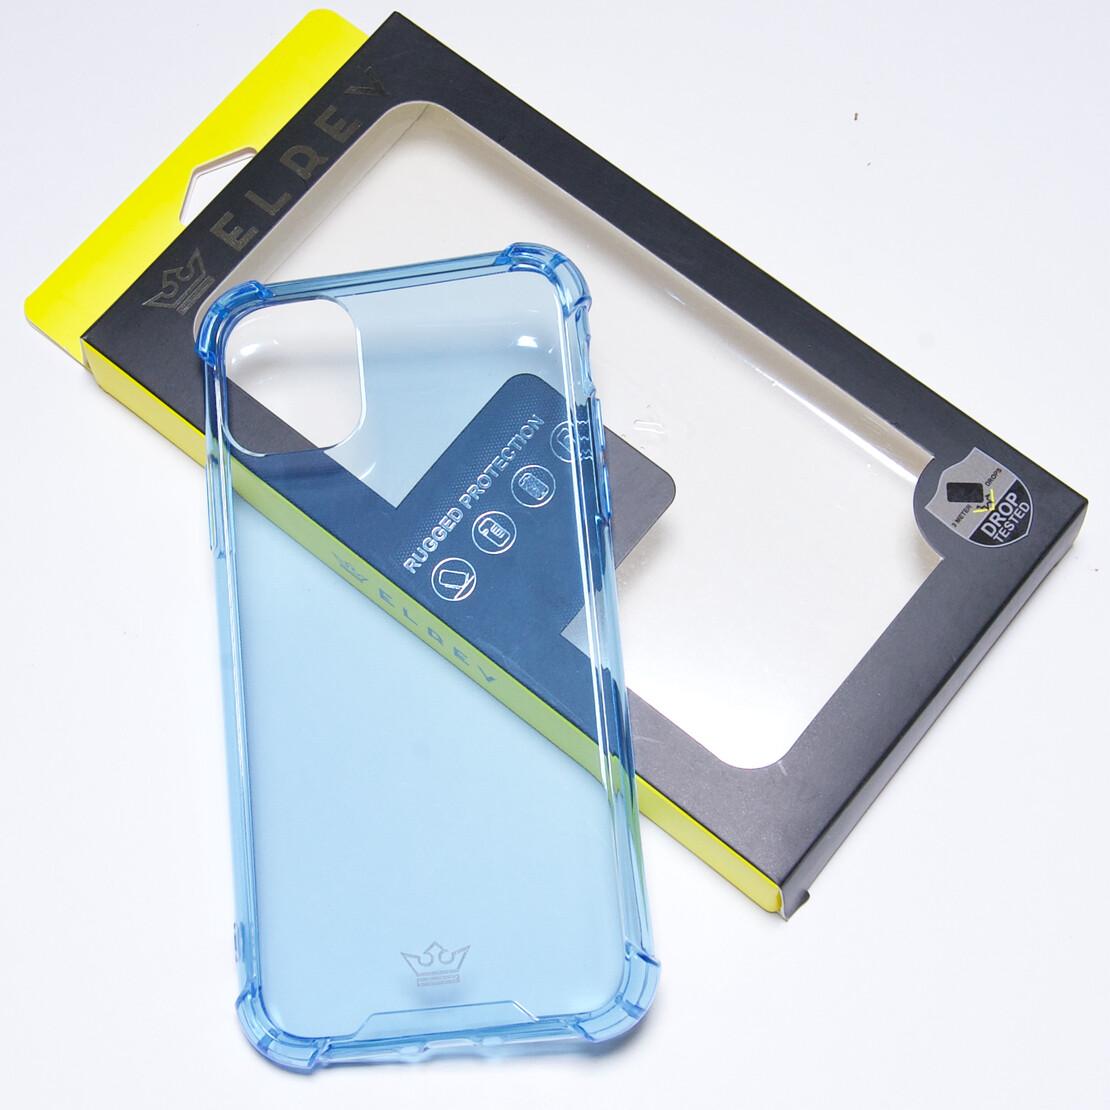 Estuche EL REY Hard Case Flexible Reforzado Celeste - Iphone 11 Pro